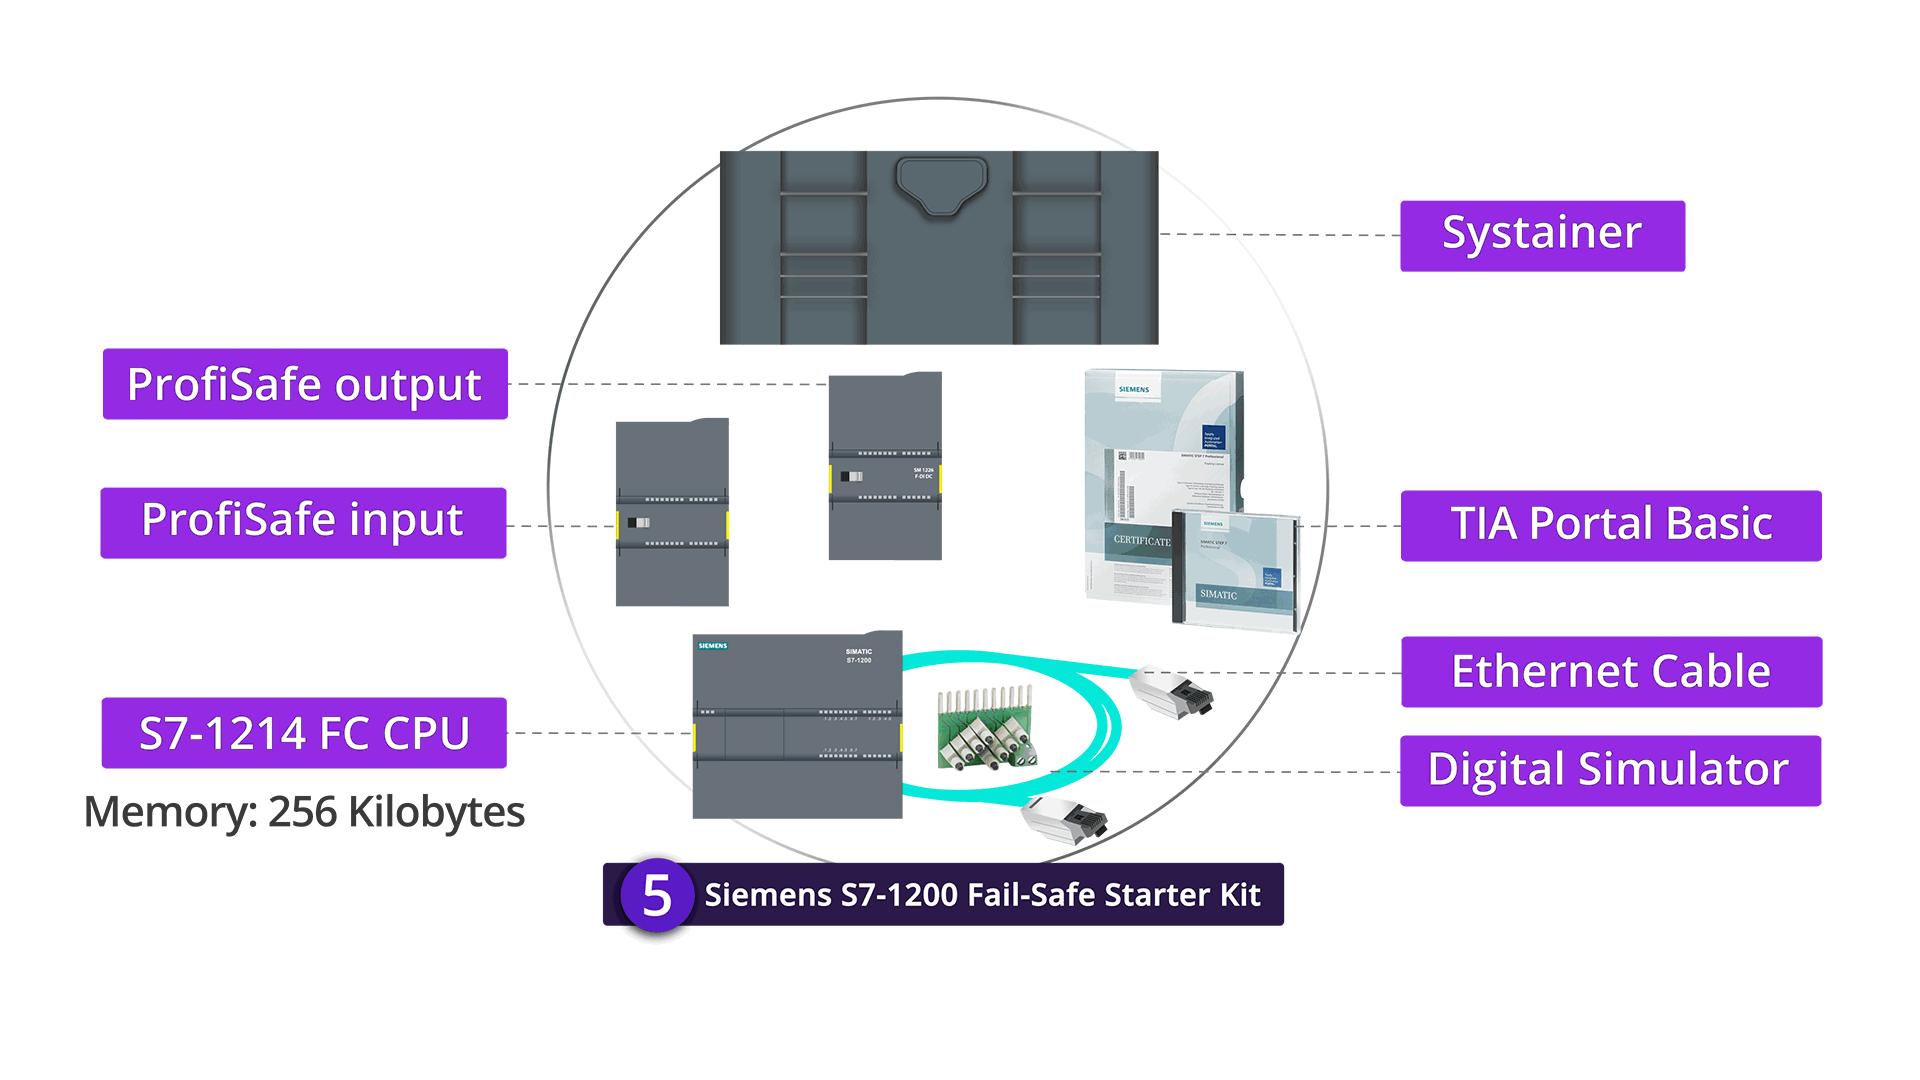 S7-1200 Fail - Safe Starter Kit